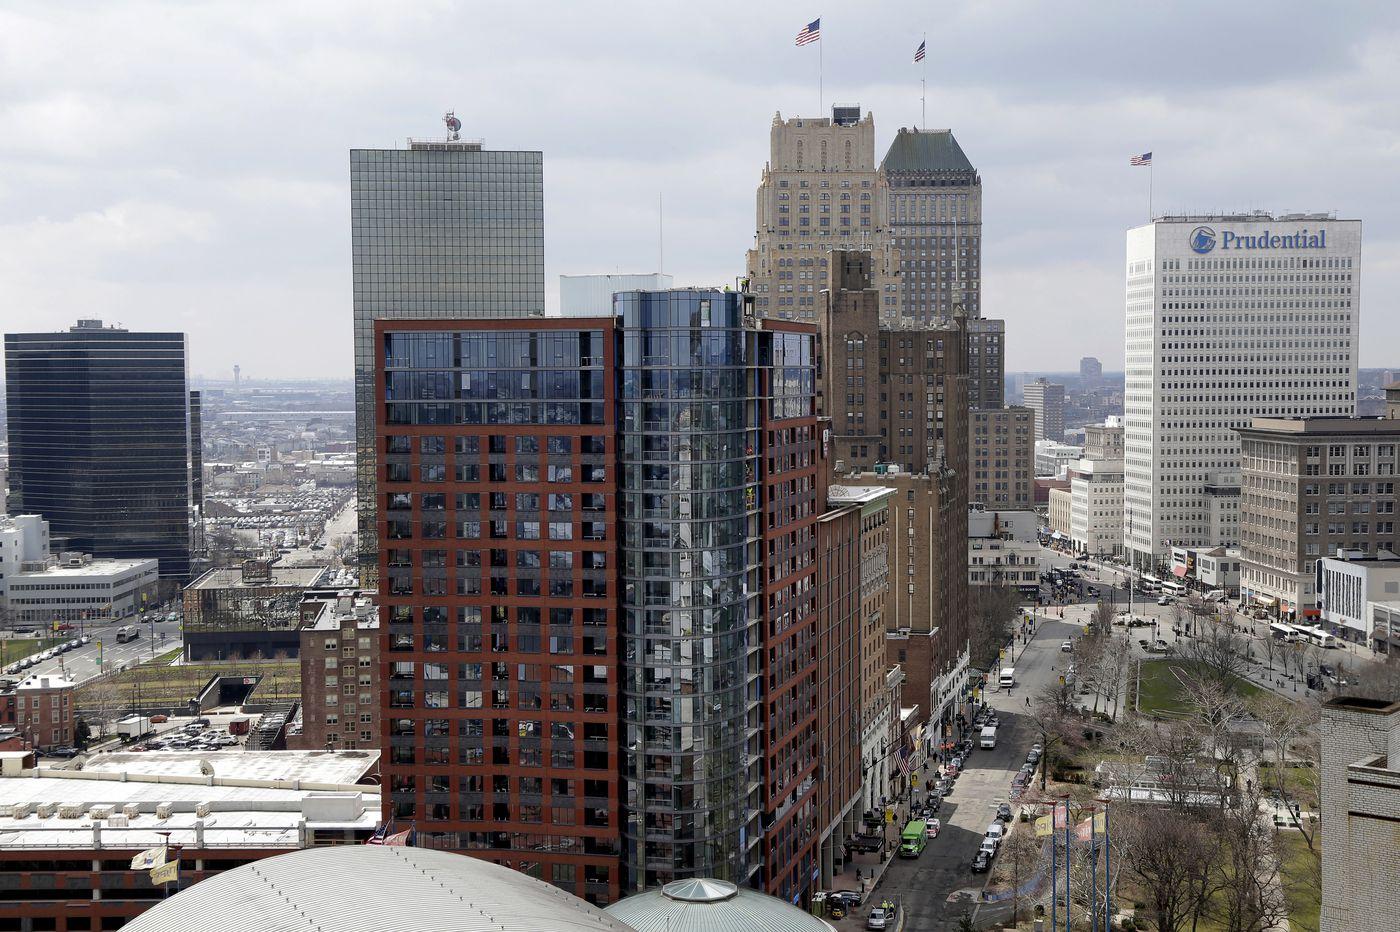 Newark landmark Gateway Center bought for $300 million; high-end shopping, public spaces planned